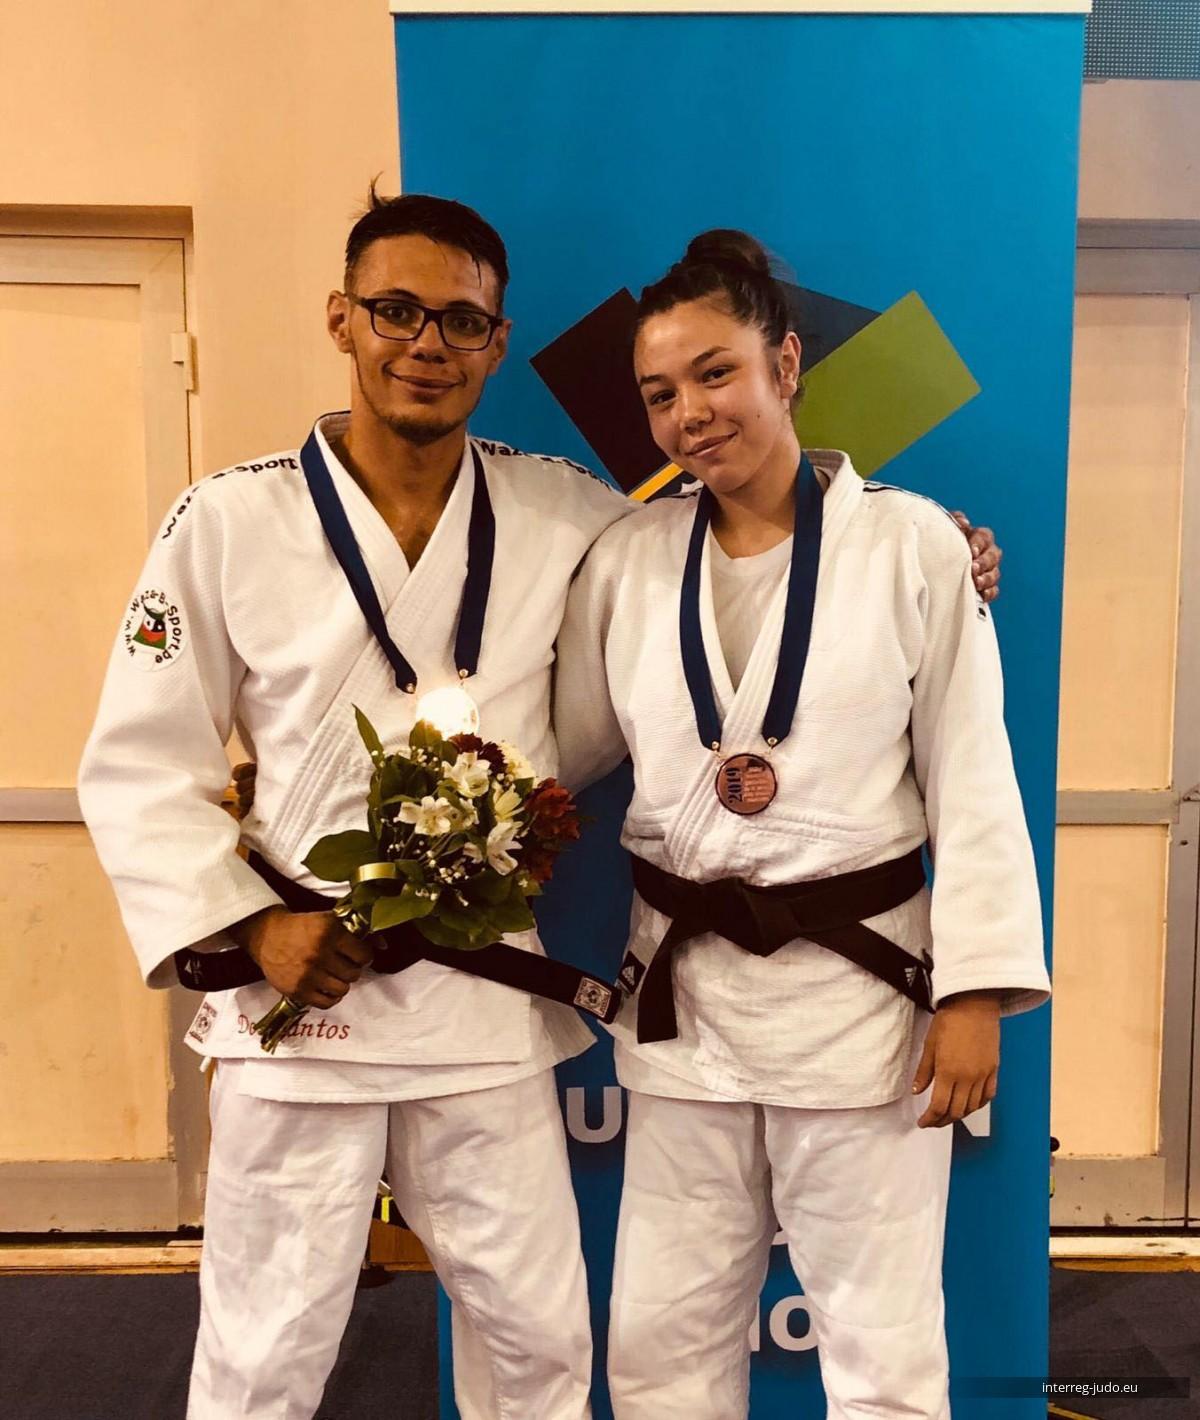 Pictures Interreg Judo Team - U21 European Judo Cup Cluj-Napoca (ROU) 10-11.08.2019